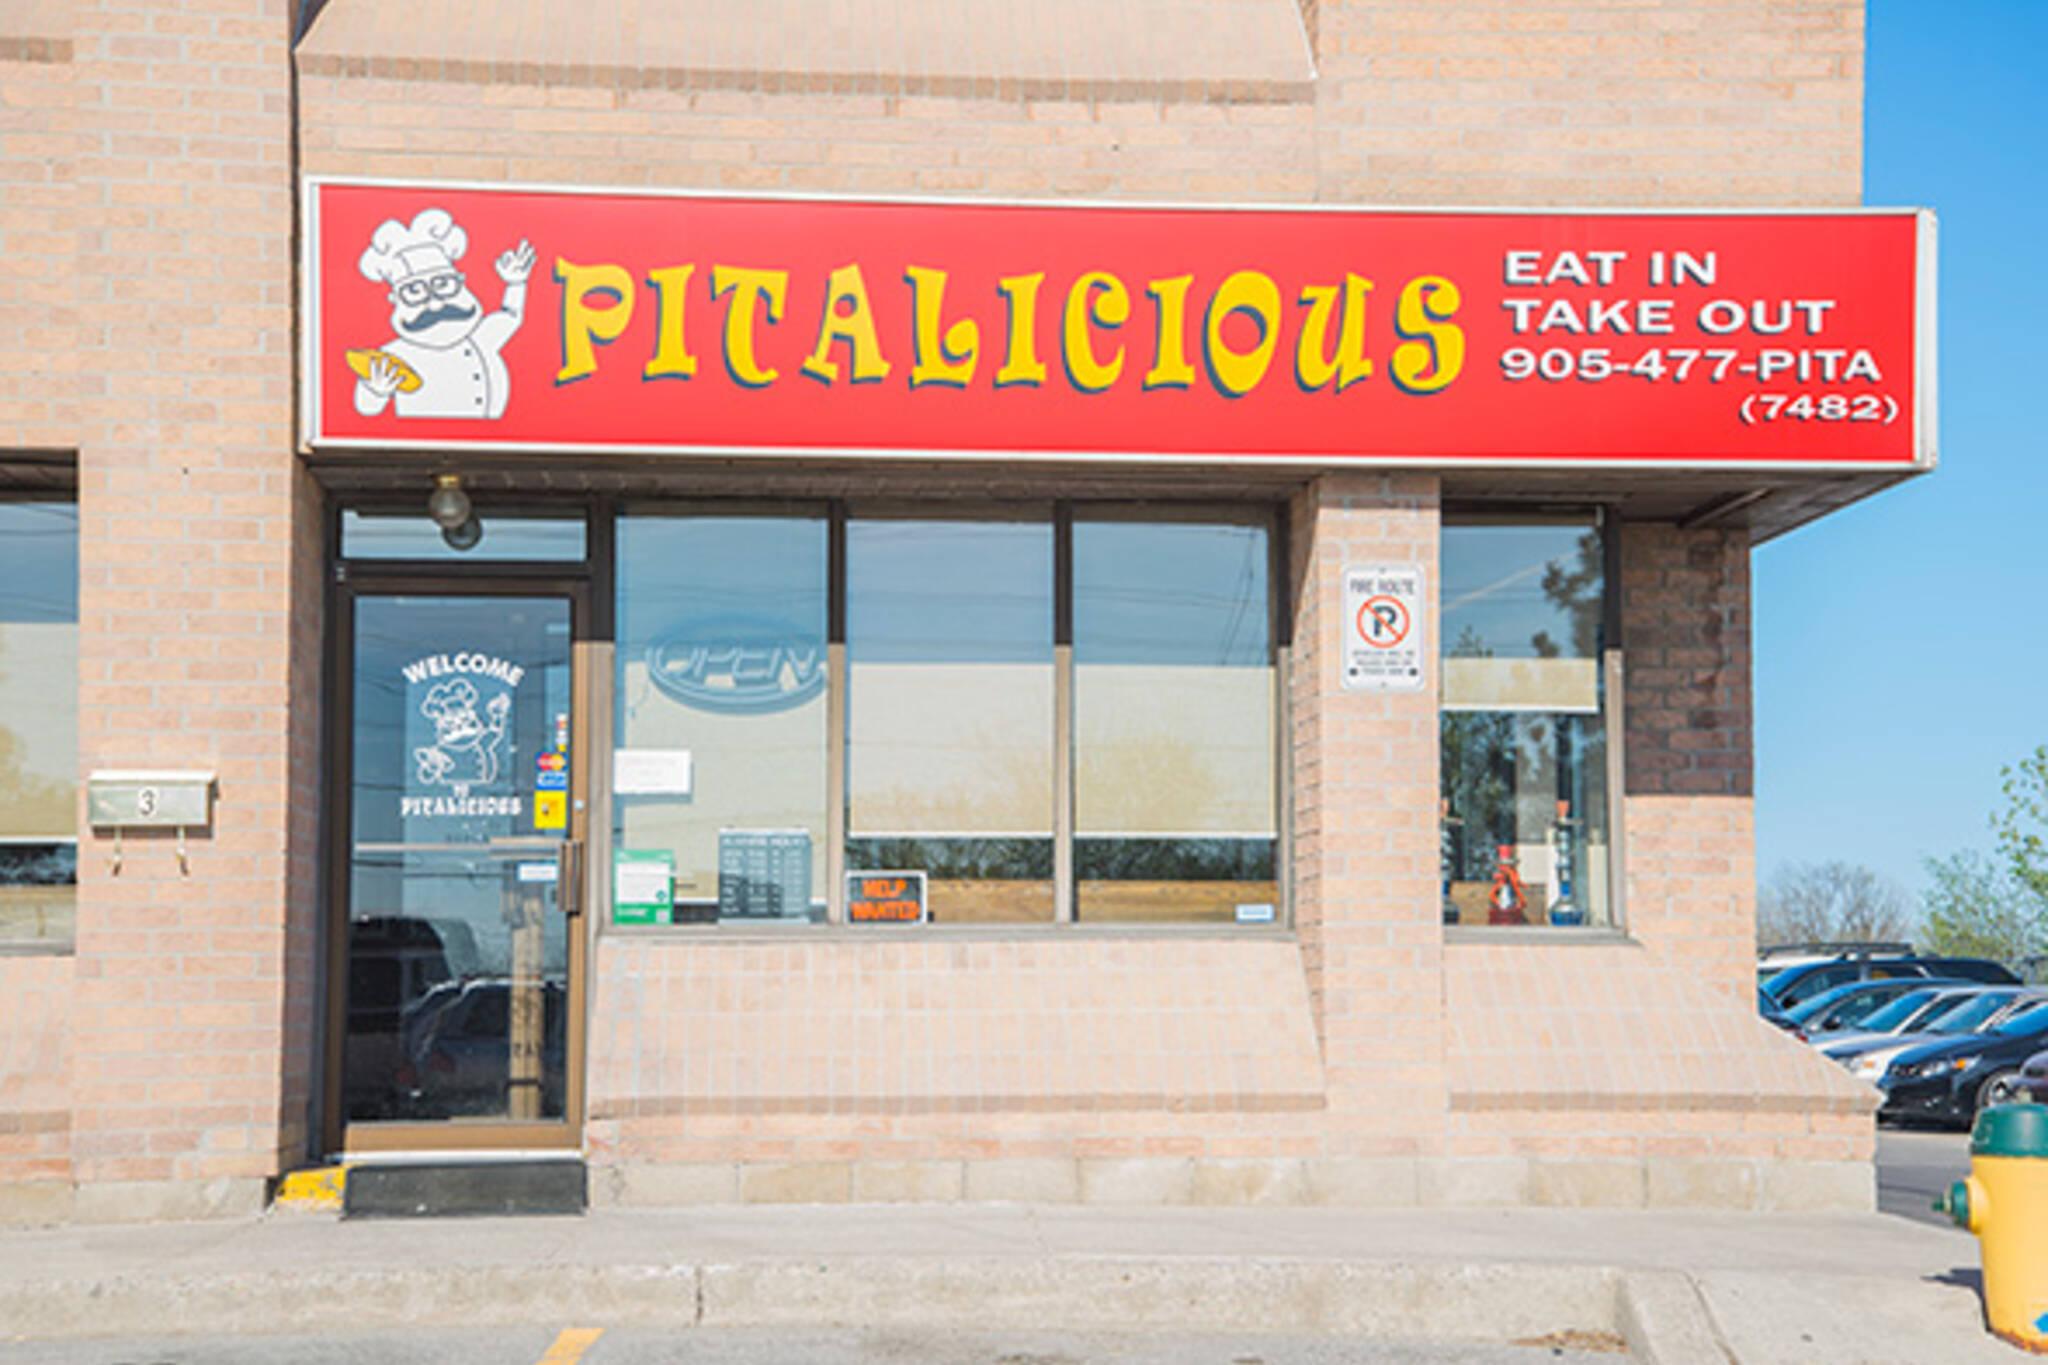 Pitalicious